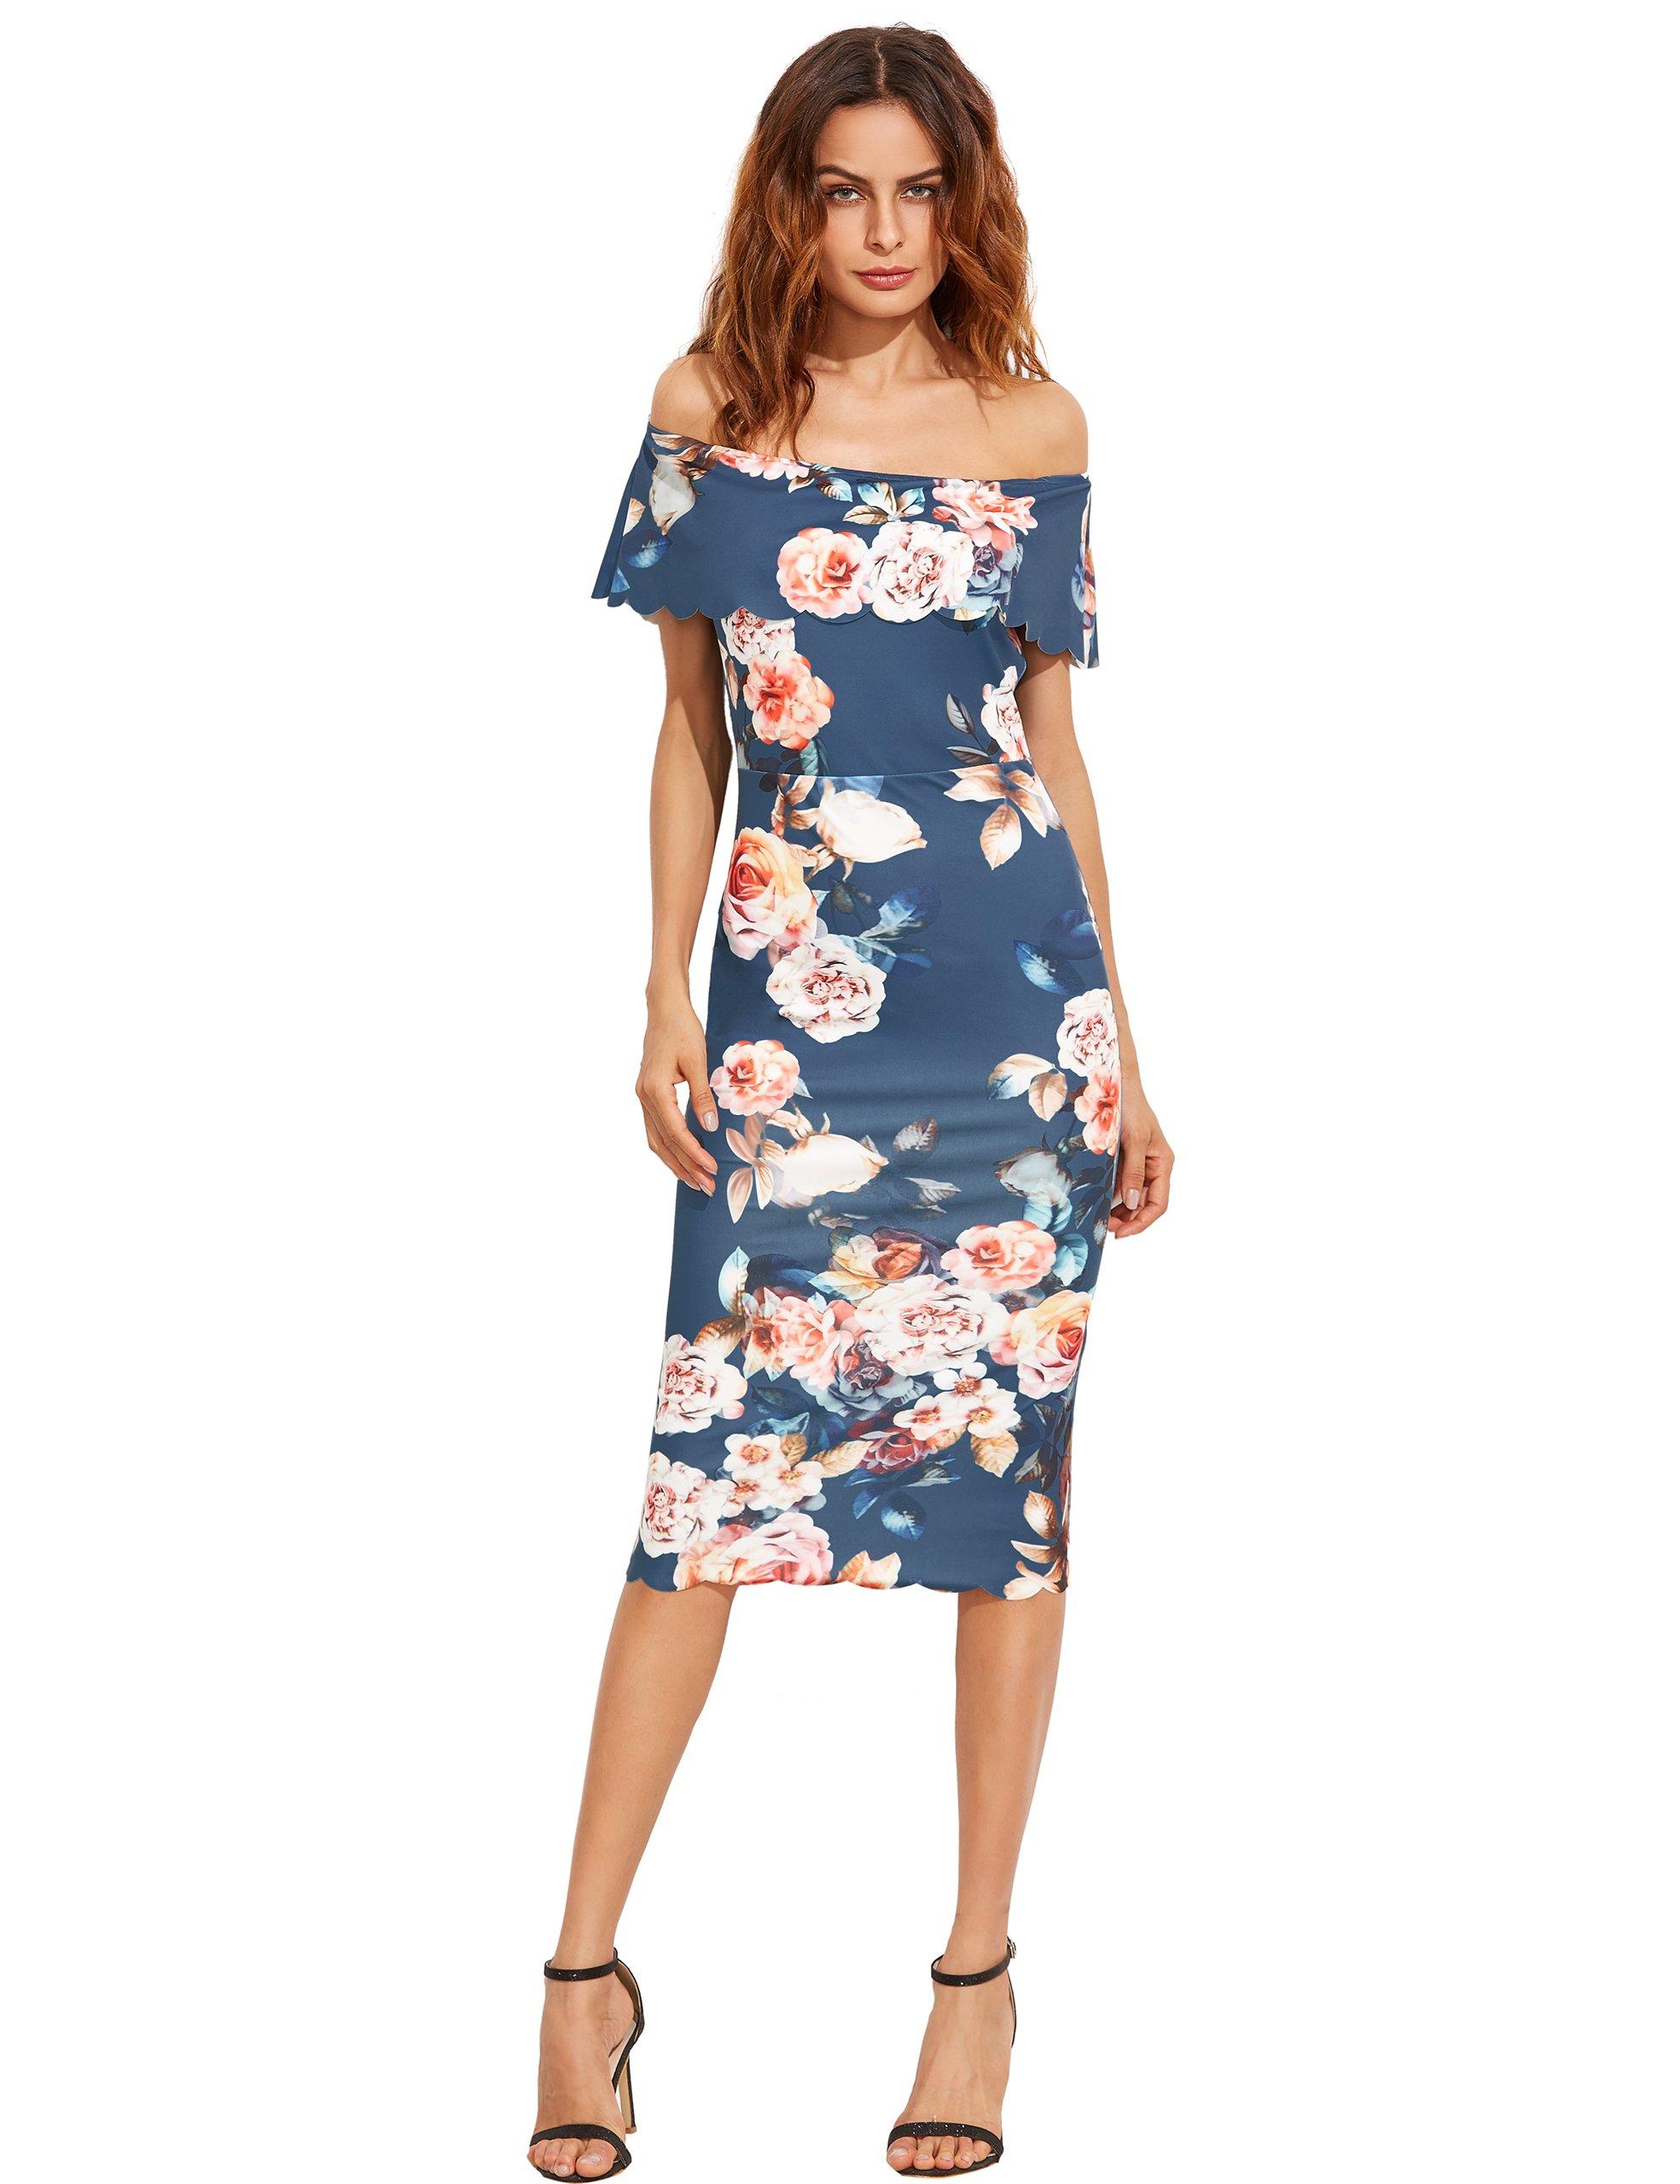 MakeMeChic Women's Floral Pencil Dress Knee Length Off Shoulder Cocktail Dress Blue S